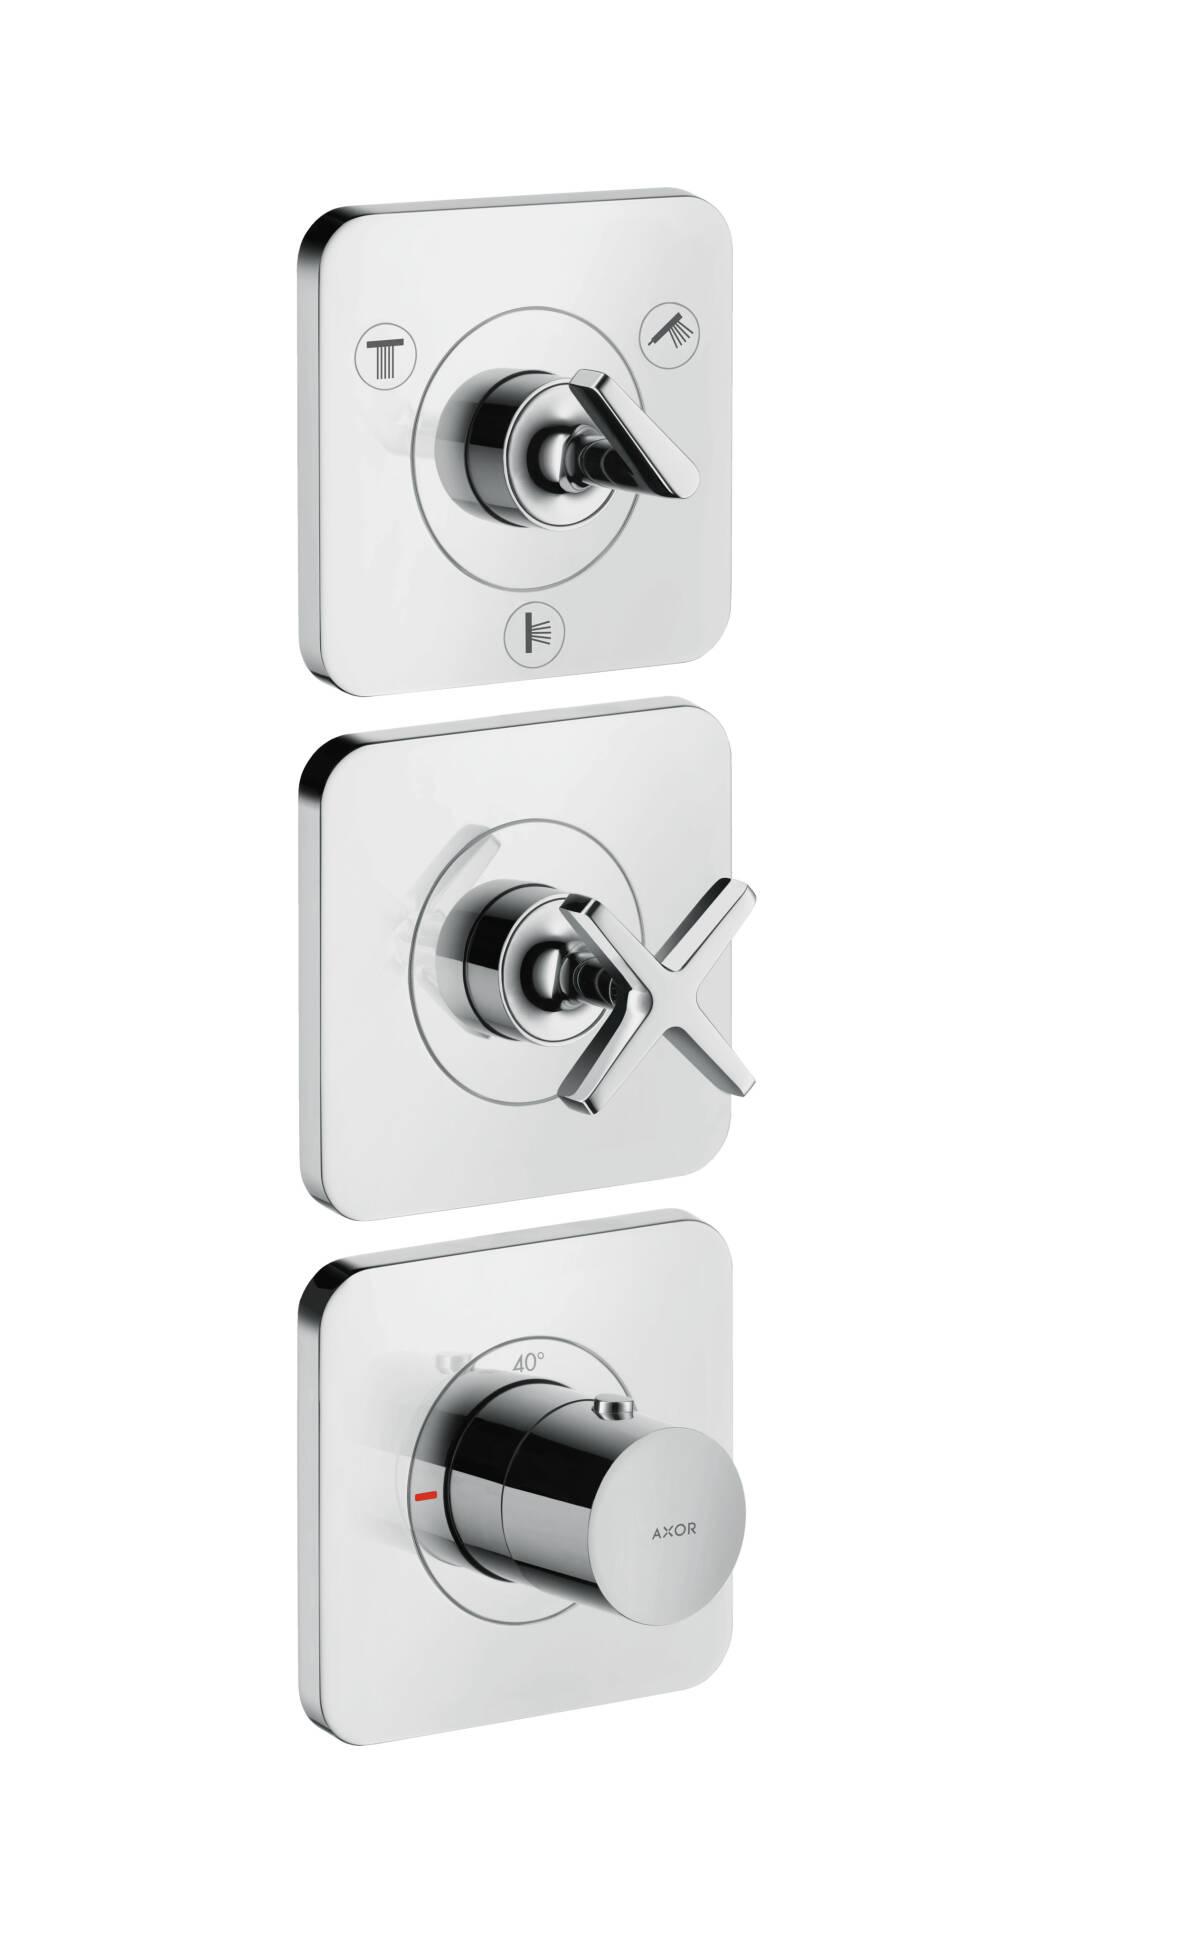 Módulo de termostato con llave de paso e inversor Quattro para 3 salidas, color oro cepillado, 36704250